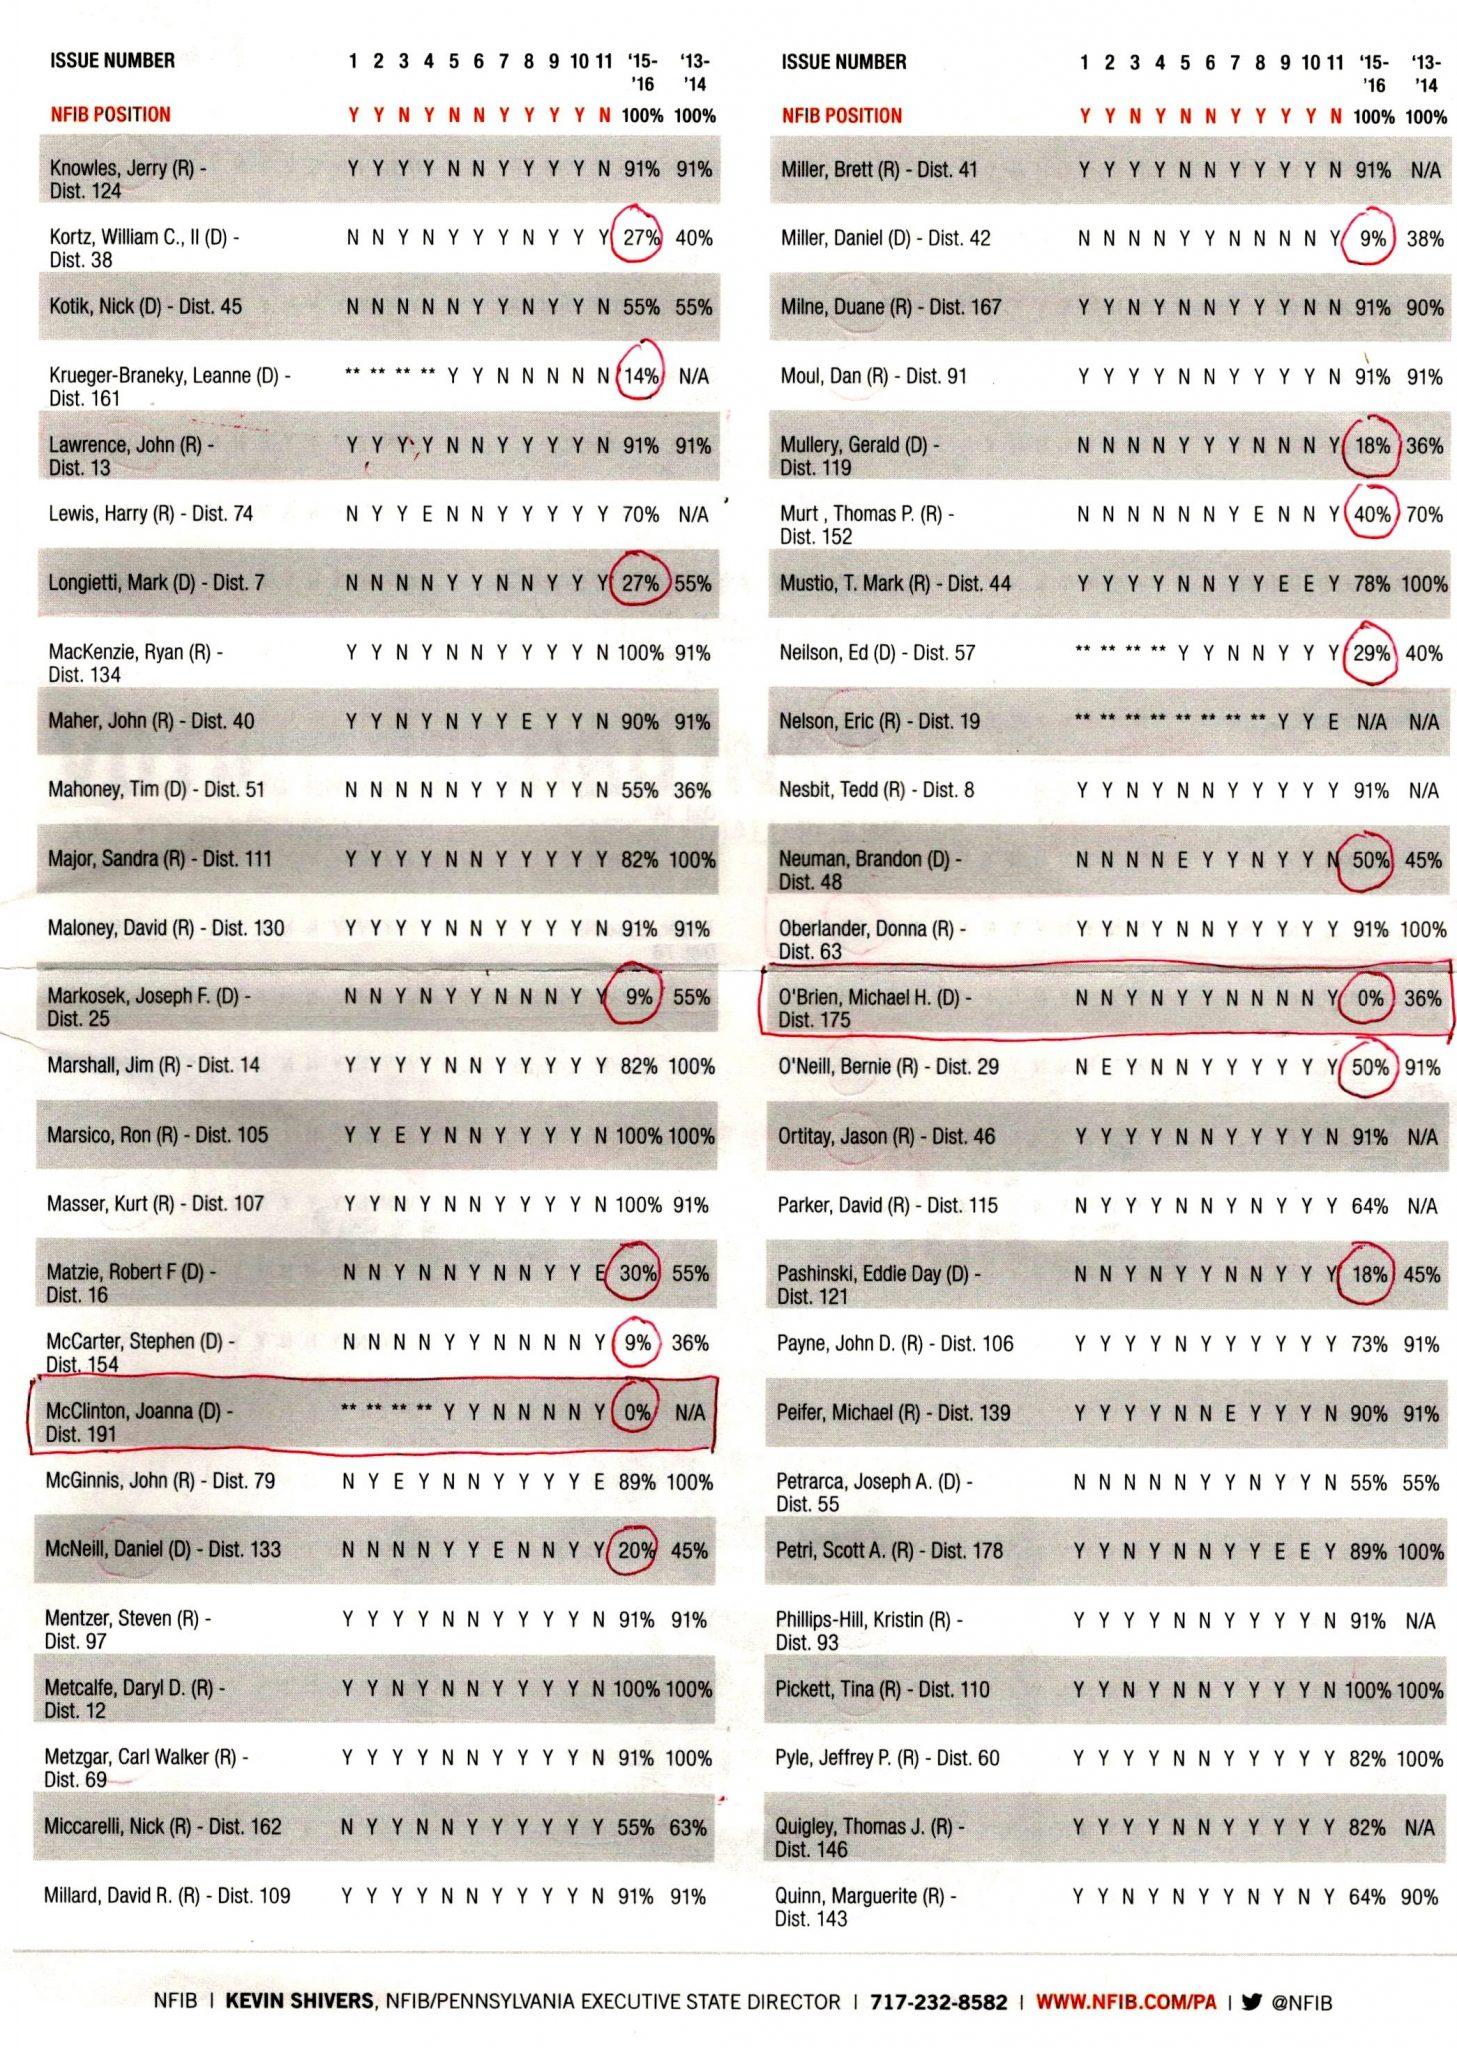 nfib-2016-pa-voting-record-5